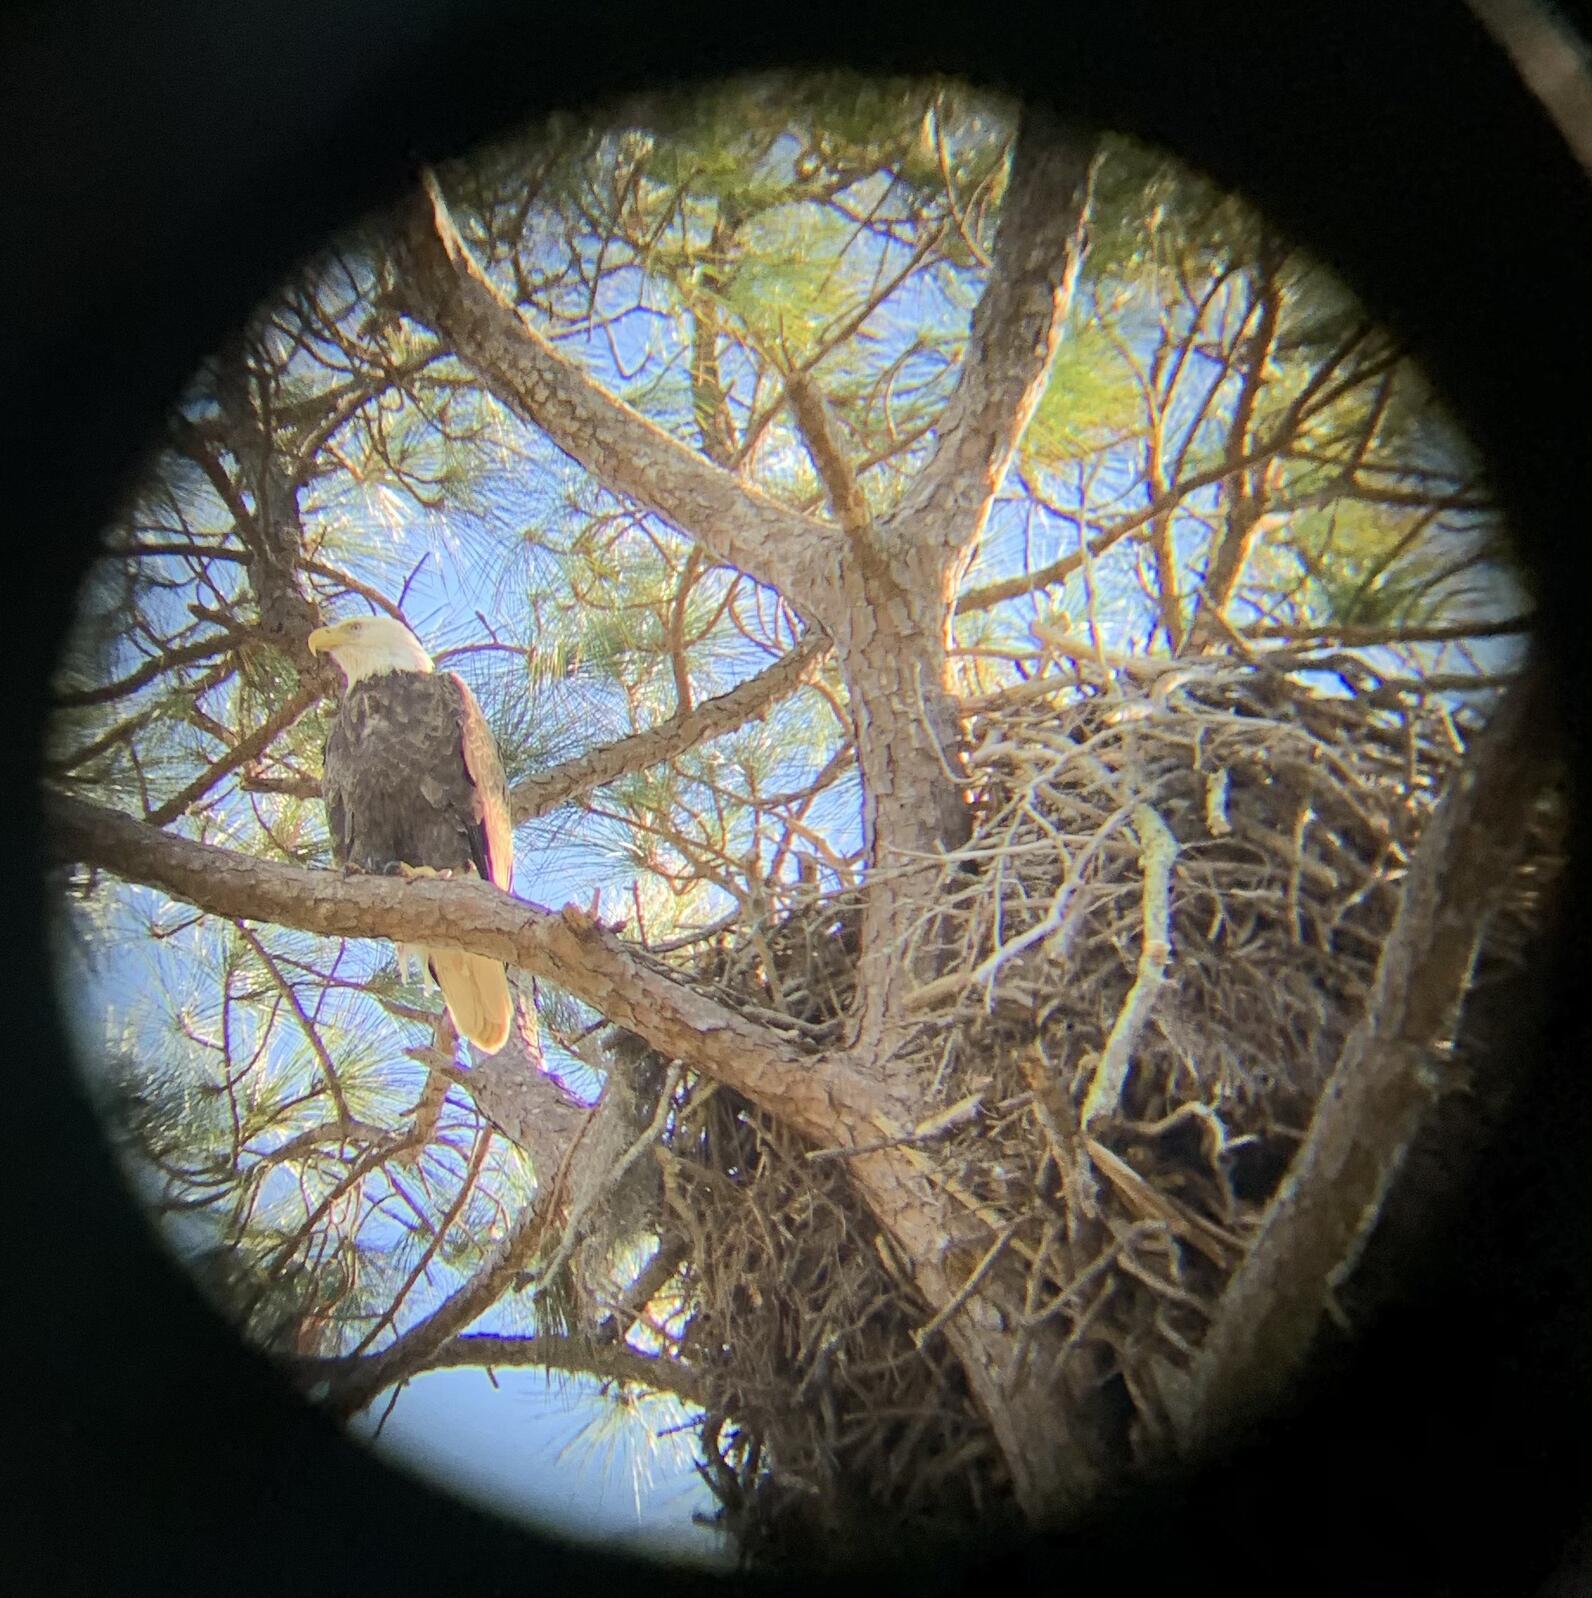 Bald Eagle nest seen through binoculars. Photo: Amanda Hull.